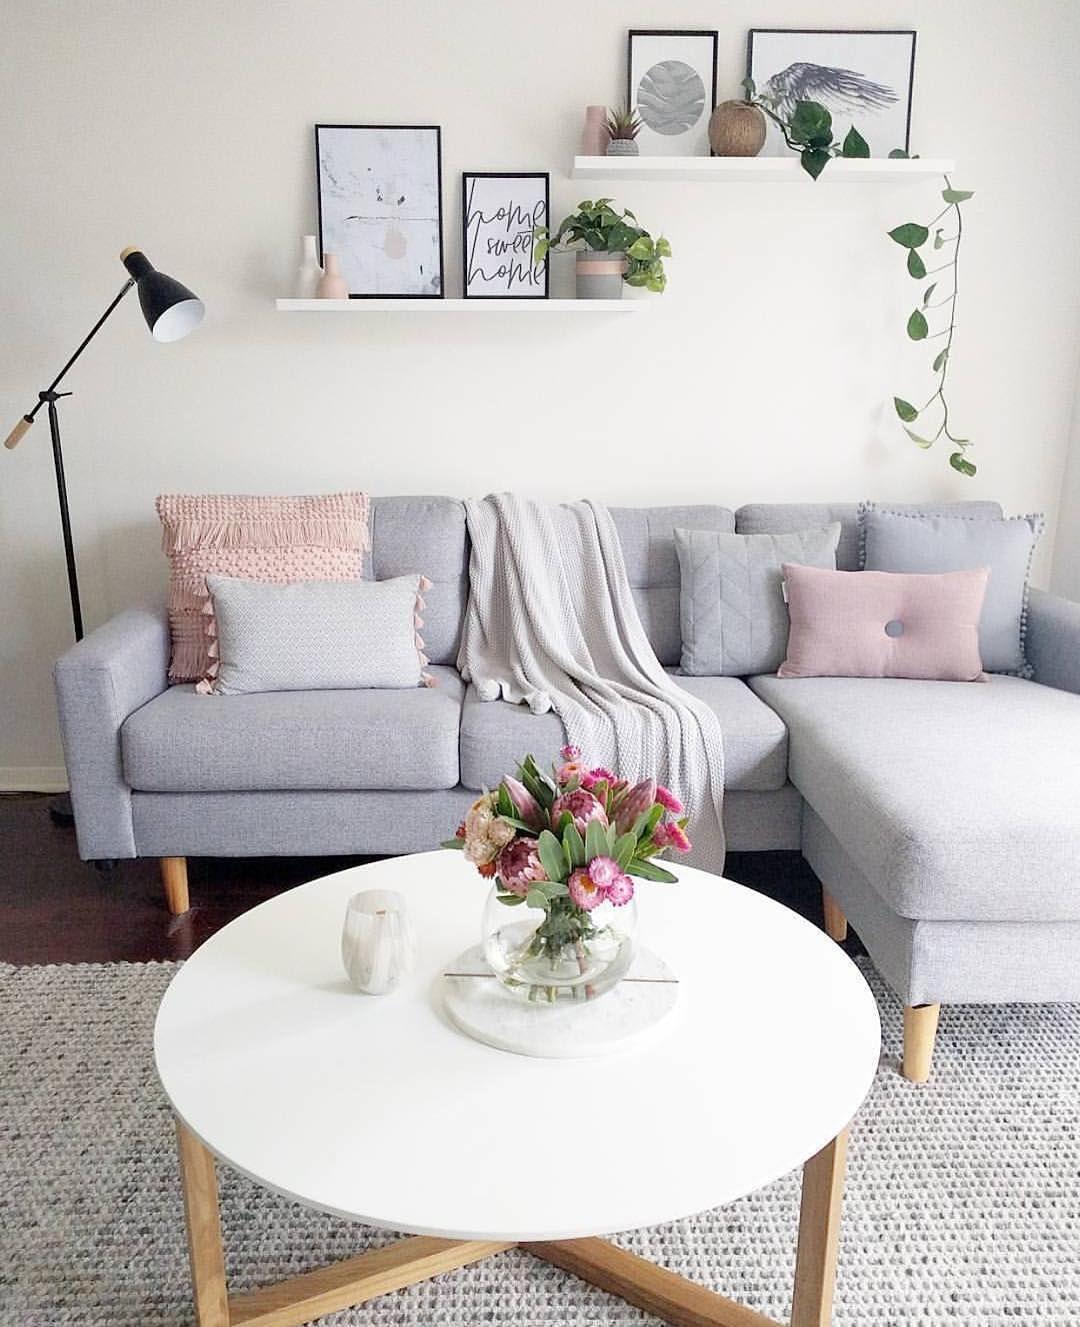 49 Inspiring Living Room Ideas For Home – Blog